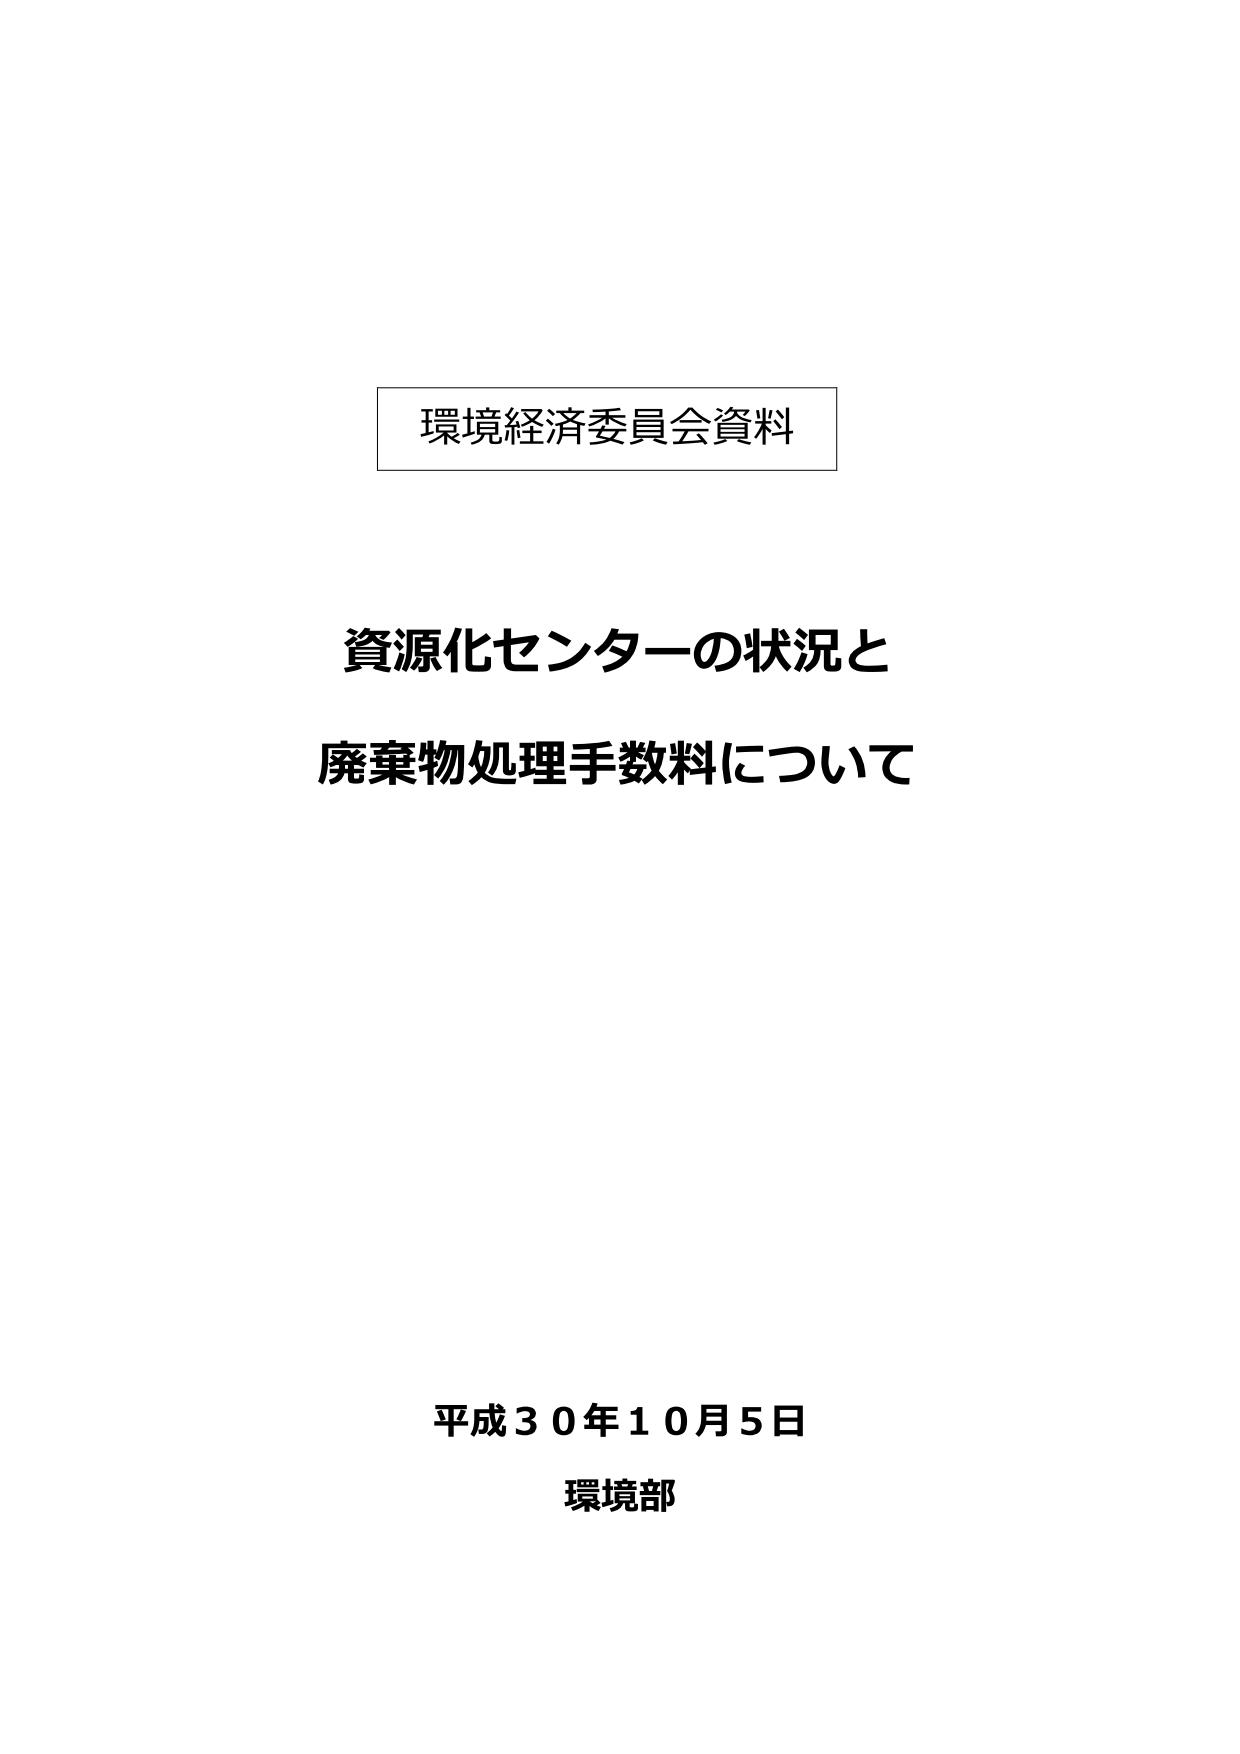 181113_181005kankyokeizai_01